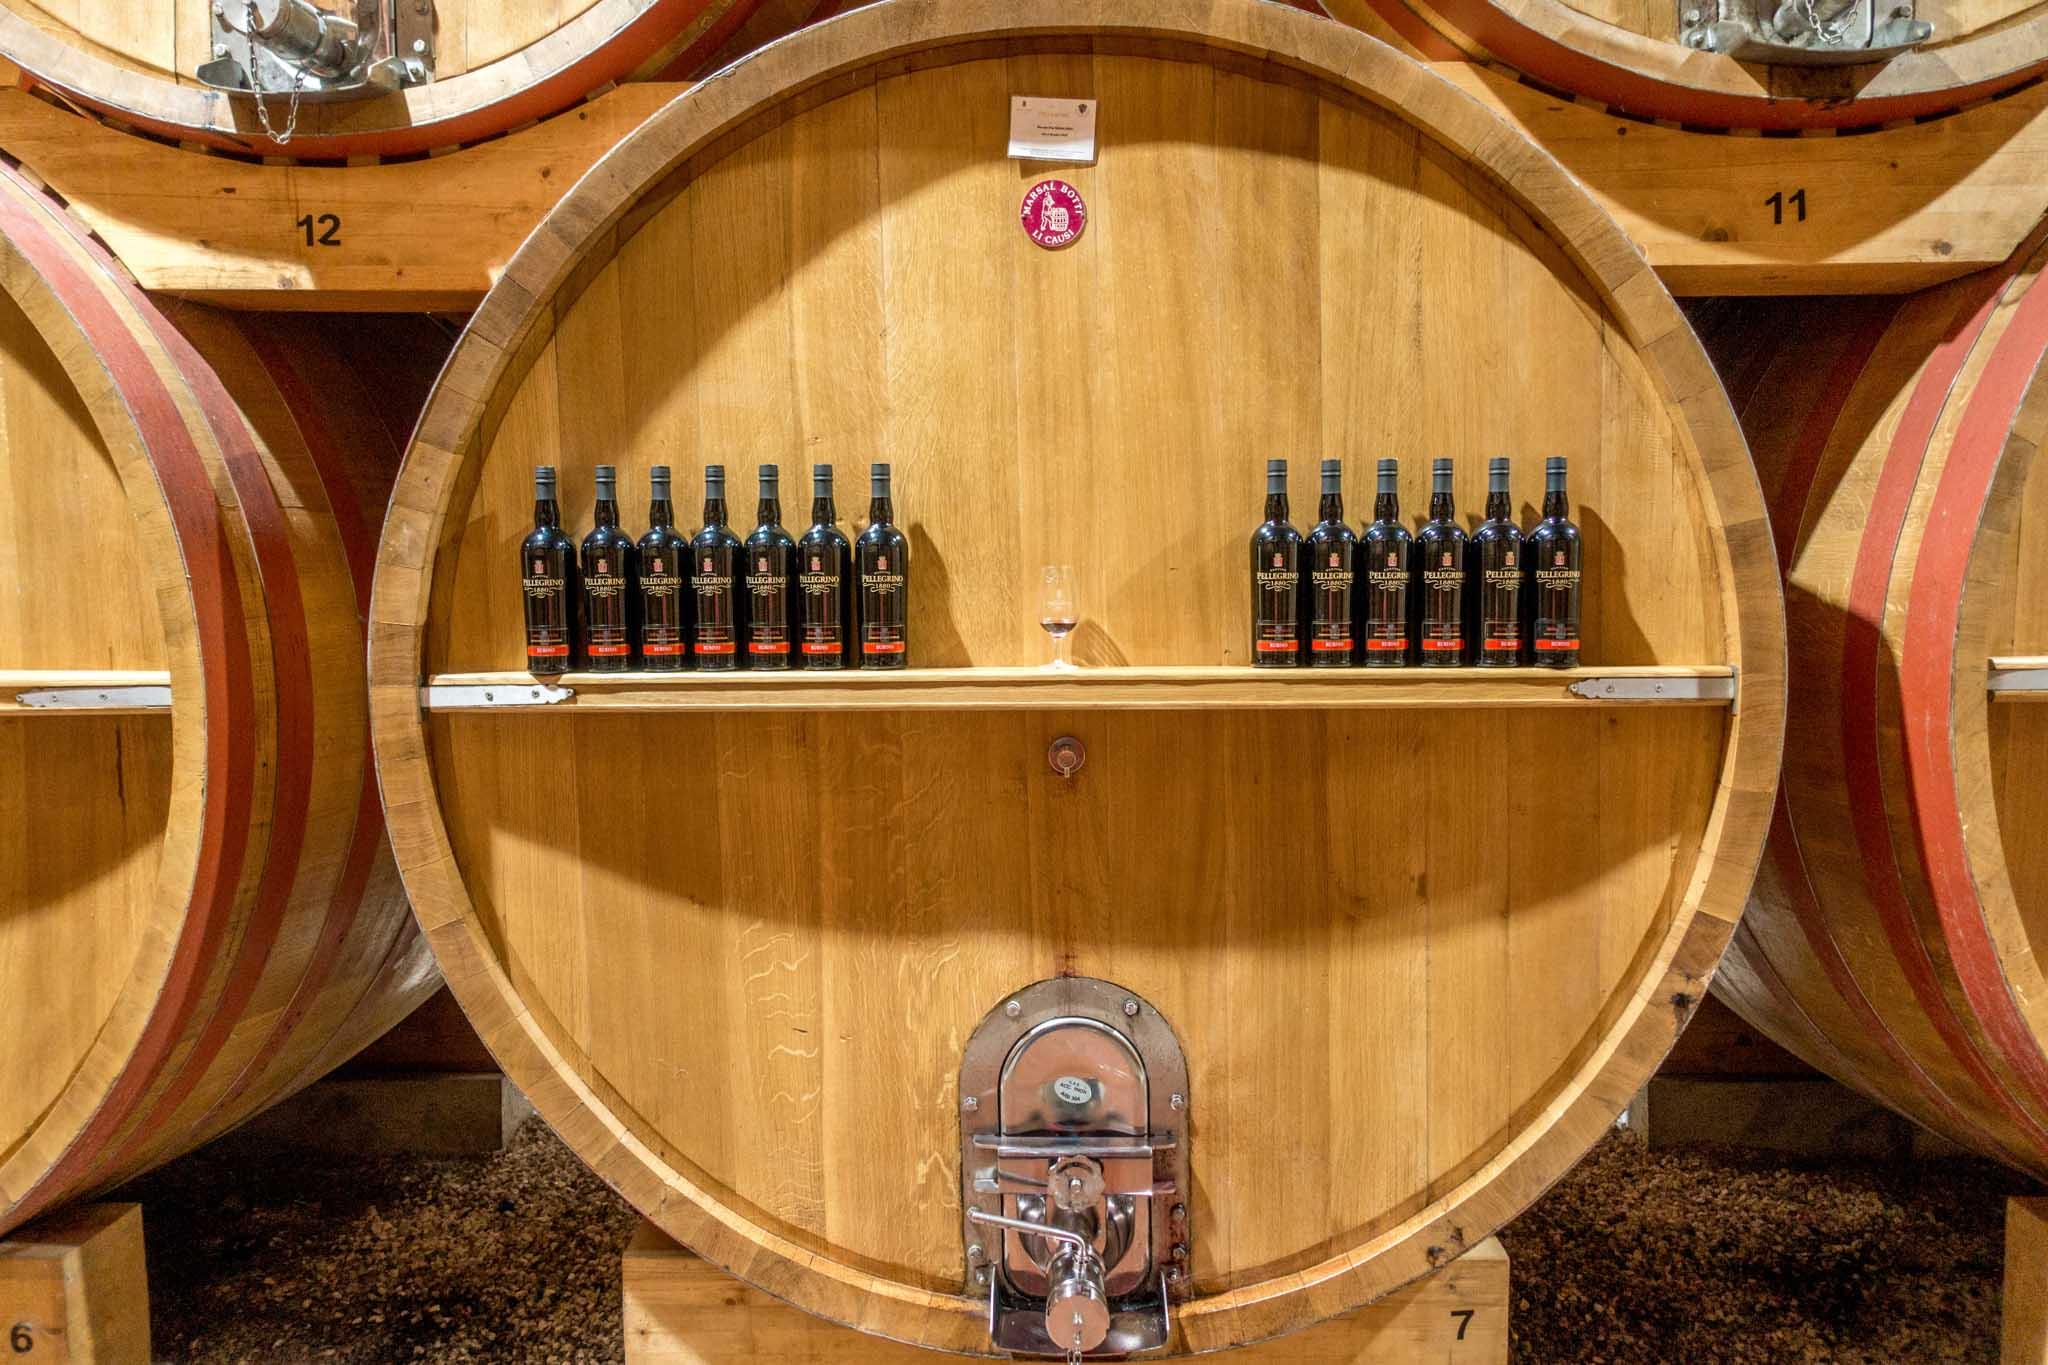 Marsala wine bottles on a shelf